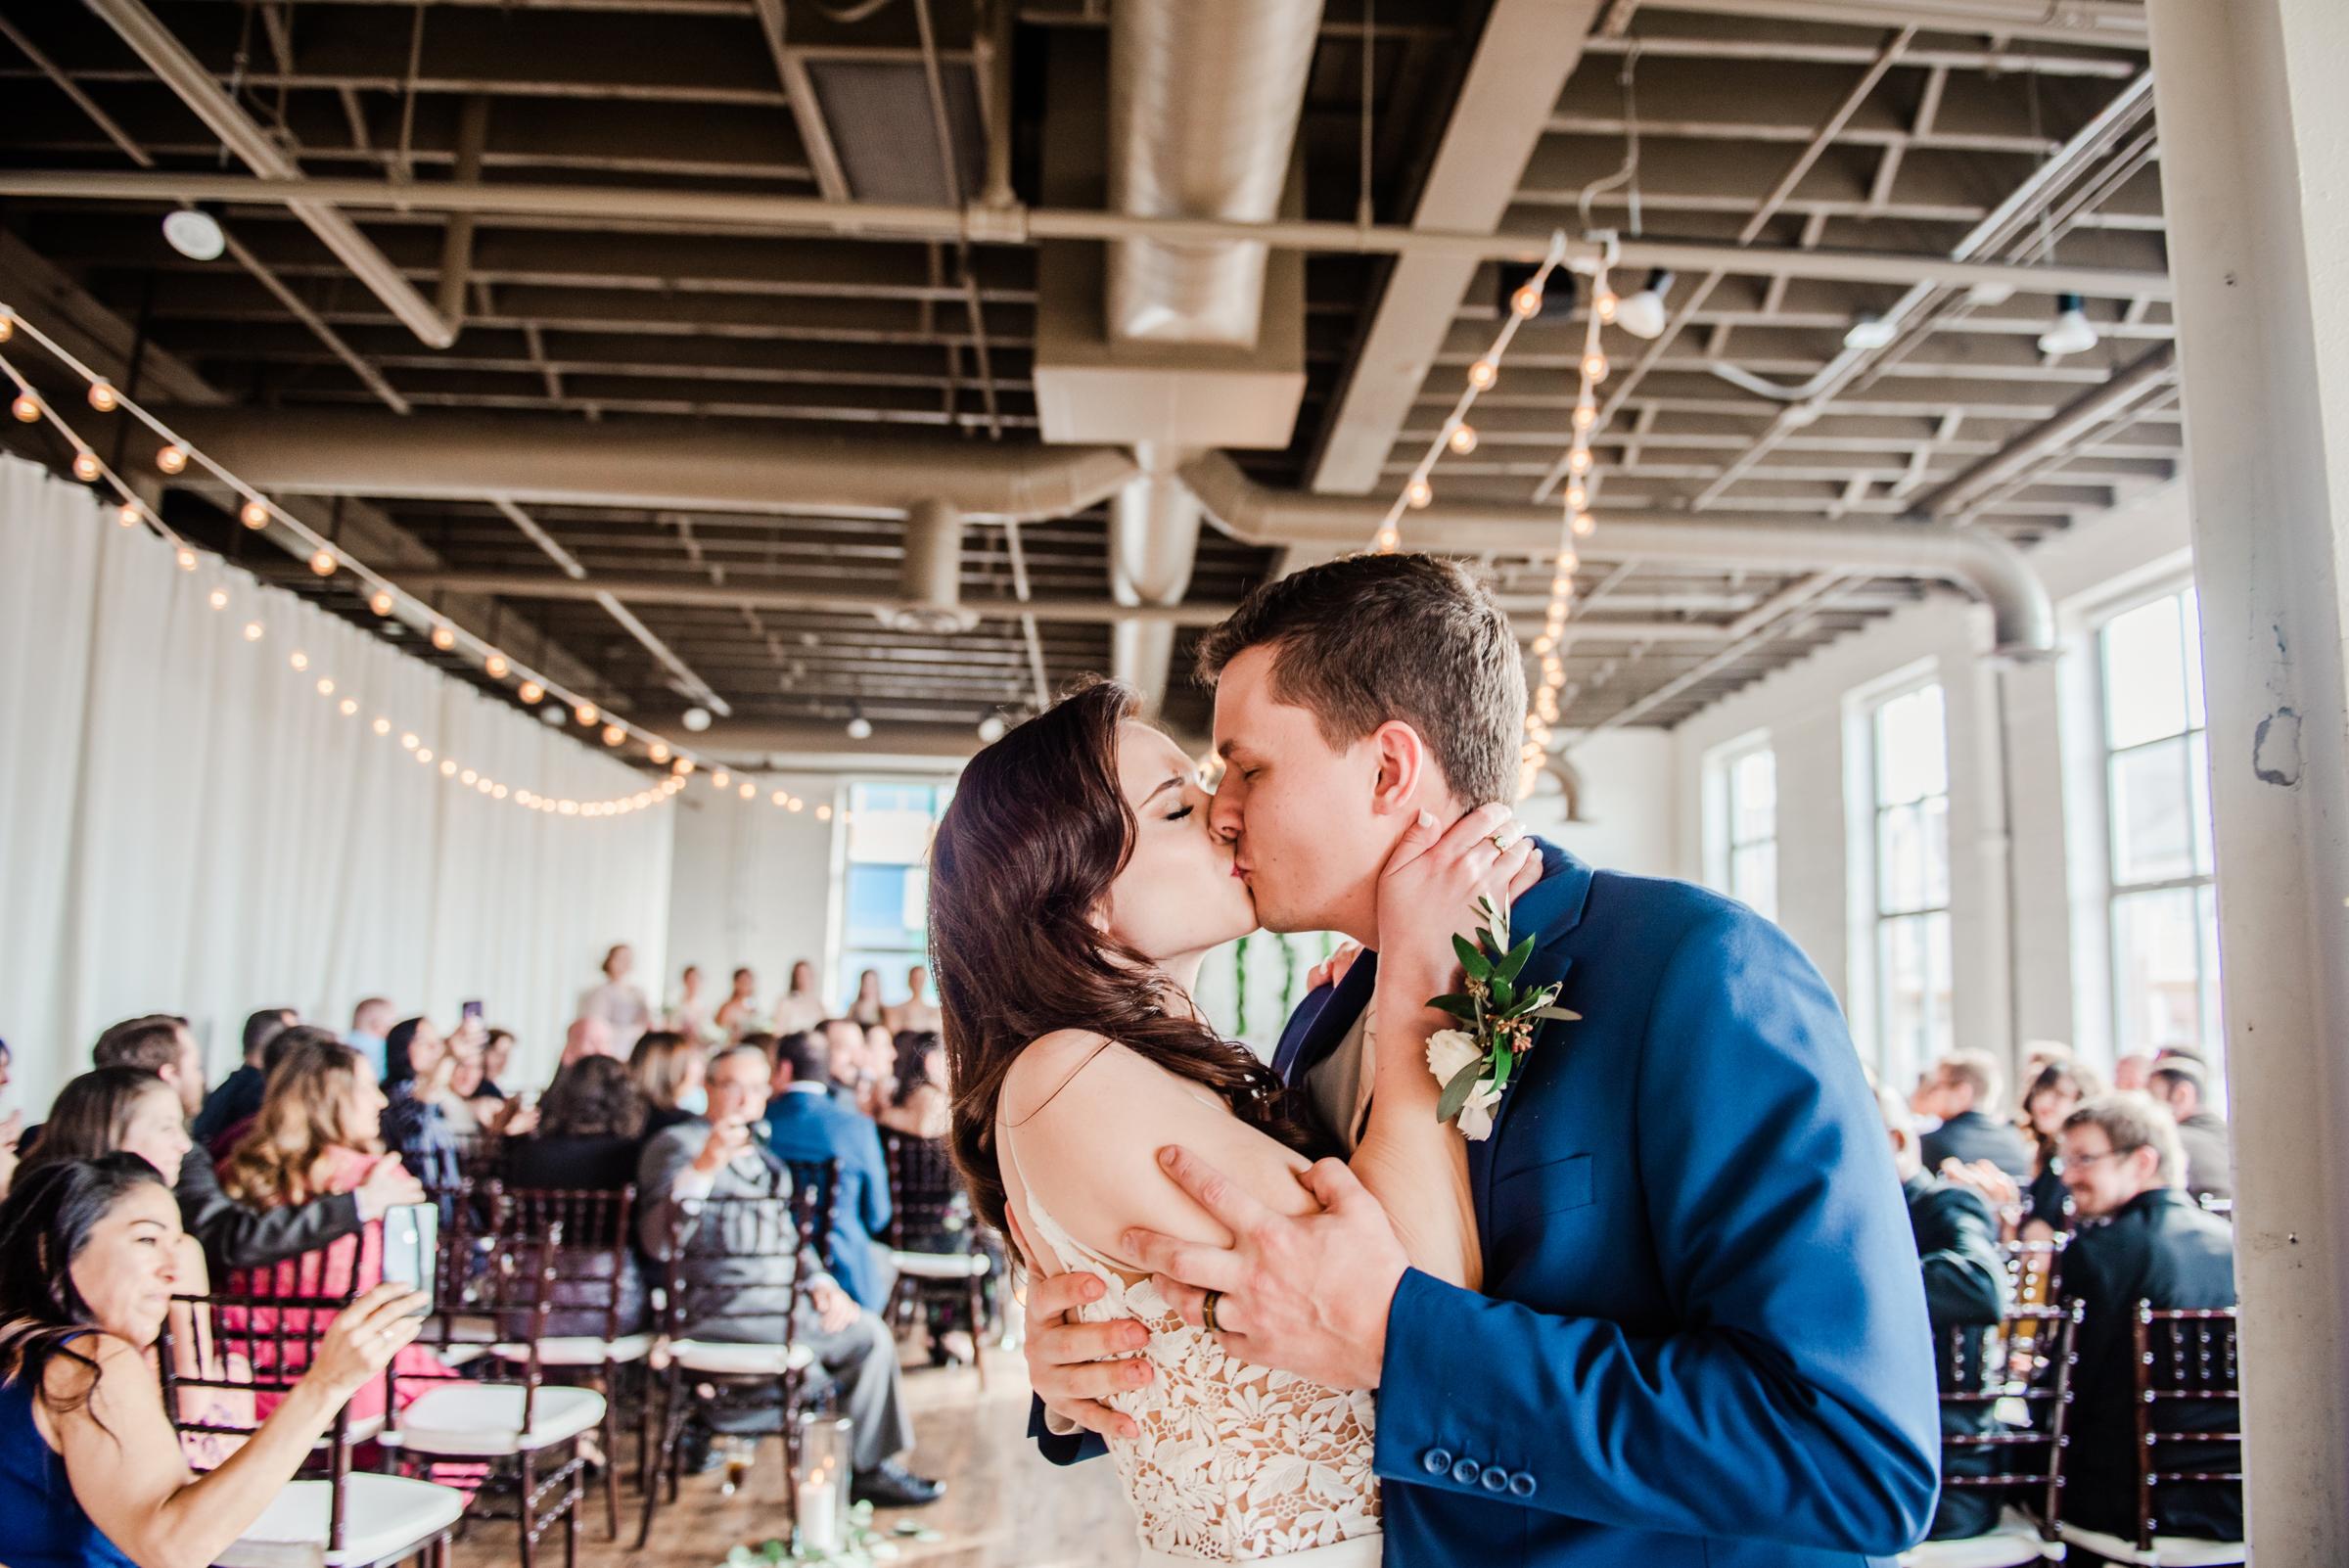 The_Arbor_LoftRochester_Wedding_JILL_STUDIO_Rochester_NY_Photographer_171719.jpg